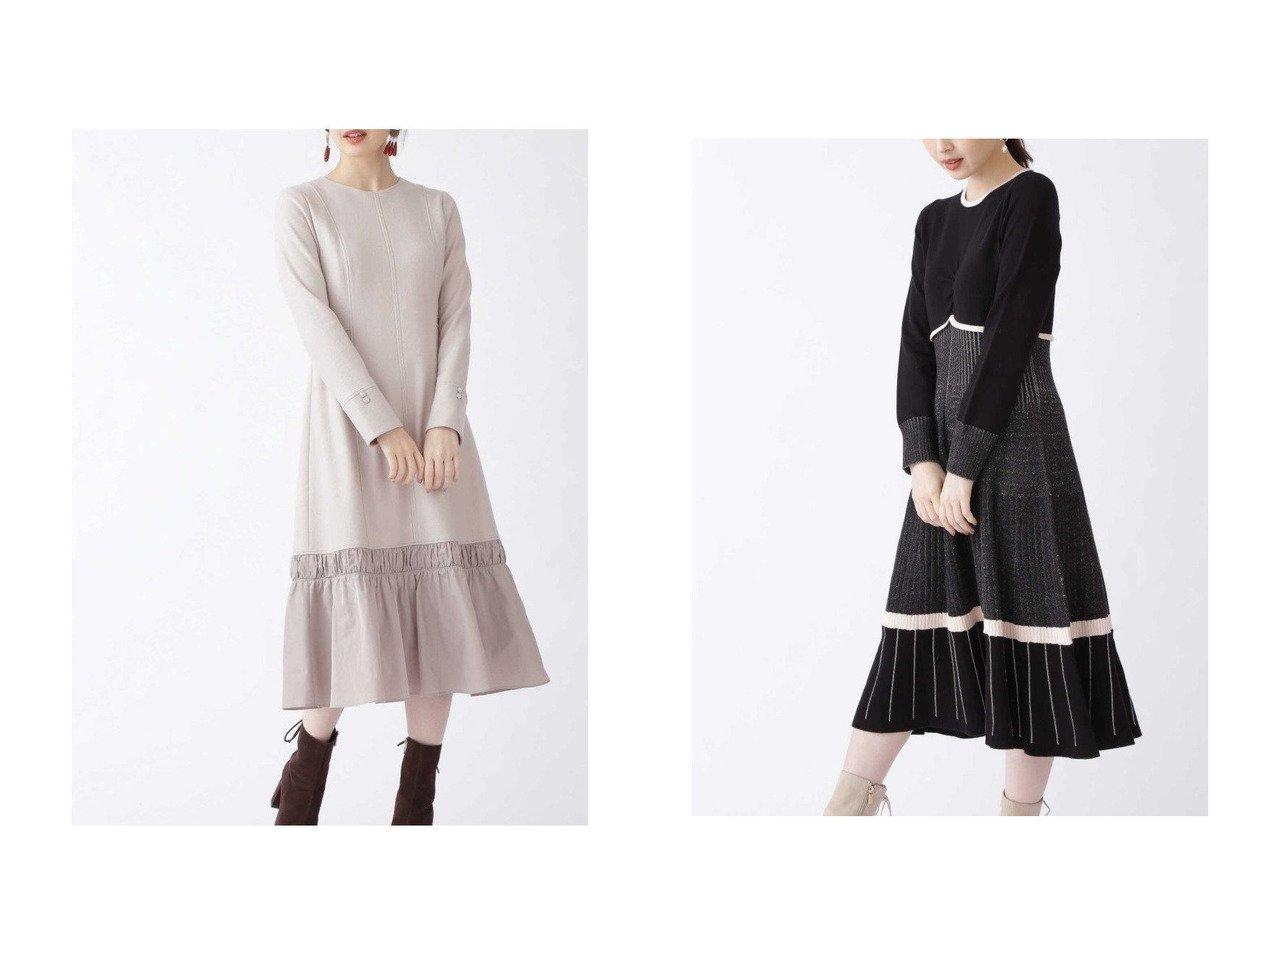 【JILLSTUART/ジルスチュアート】の《Endy ROBE》エライザニットワンピース&《Endy ROBE》オードリーワンピース ワンピース・ドレスのおすすめ!人気、トレンド・レディースファッションの通販  おすすめで人気の流行・トレンド、ファッションの通販商品 メンズファッション・キッズファッション・インテリア・家具・レディースファッション・服の通販 founy(ファニー) https://founy.com/ ファッション Fashion レディースファッション WOMEN ワンピース Dress ニットワンピース Knit Dresses アクセサリー コンビ シンプル ジャージ タフタ ノースリーブ フレア  ID:crp329100000010132